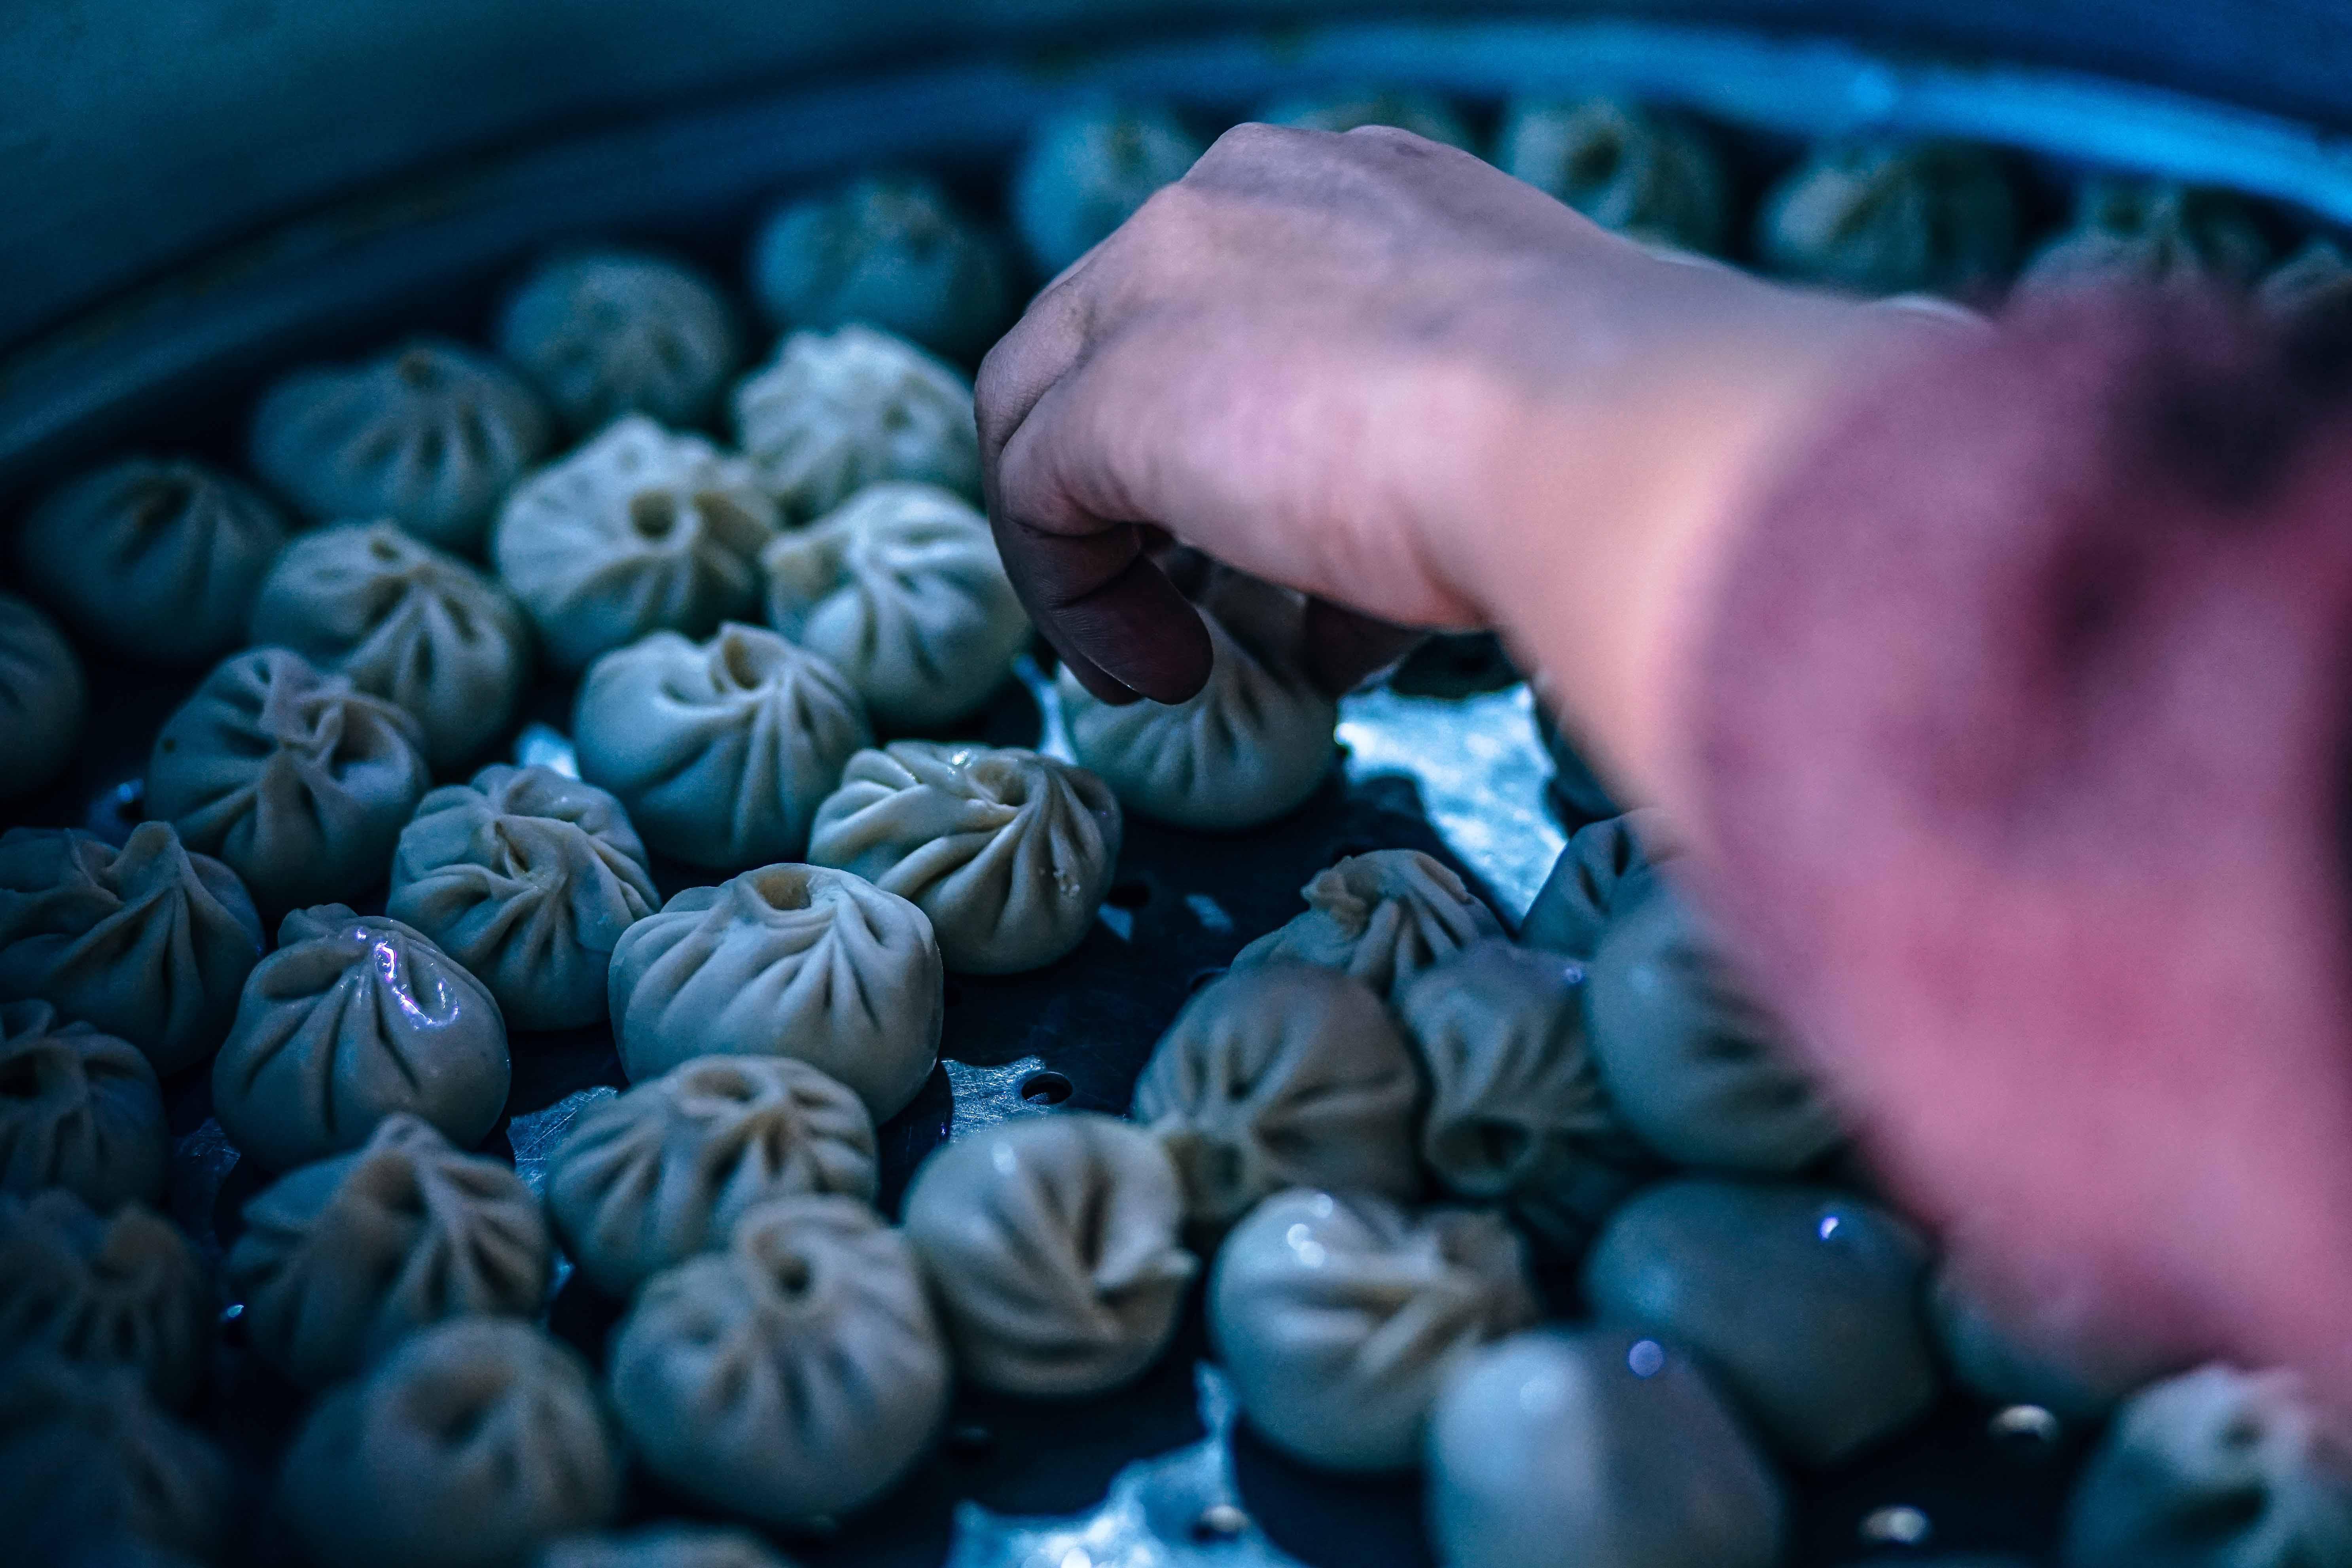 dumplings-3315963